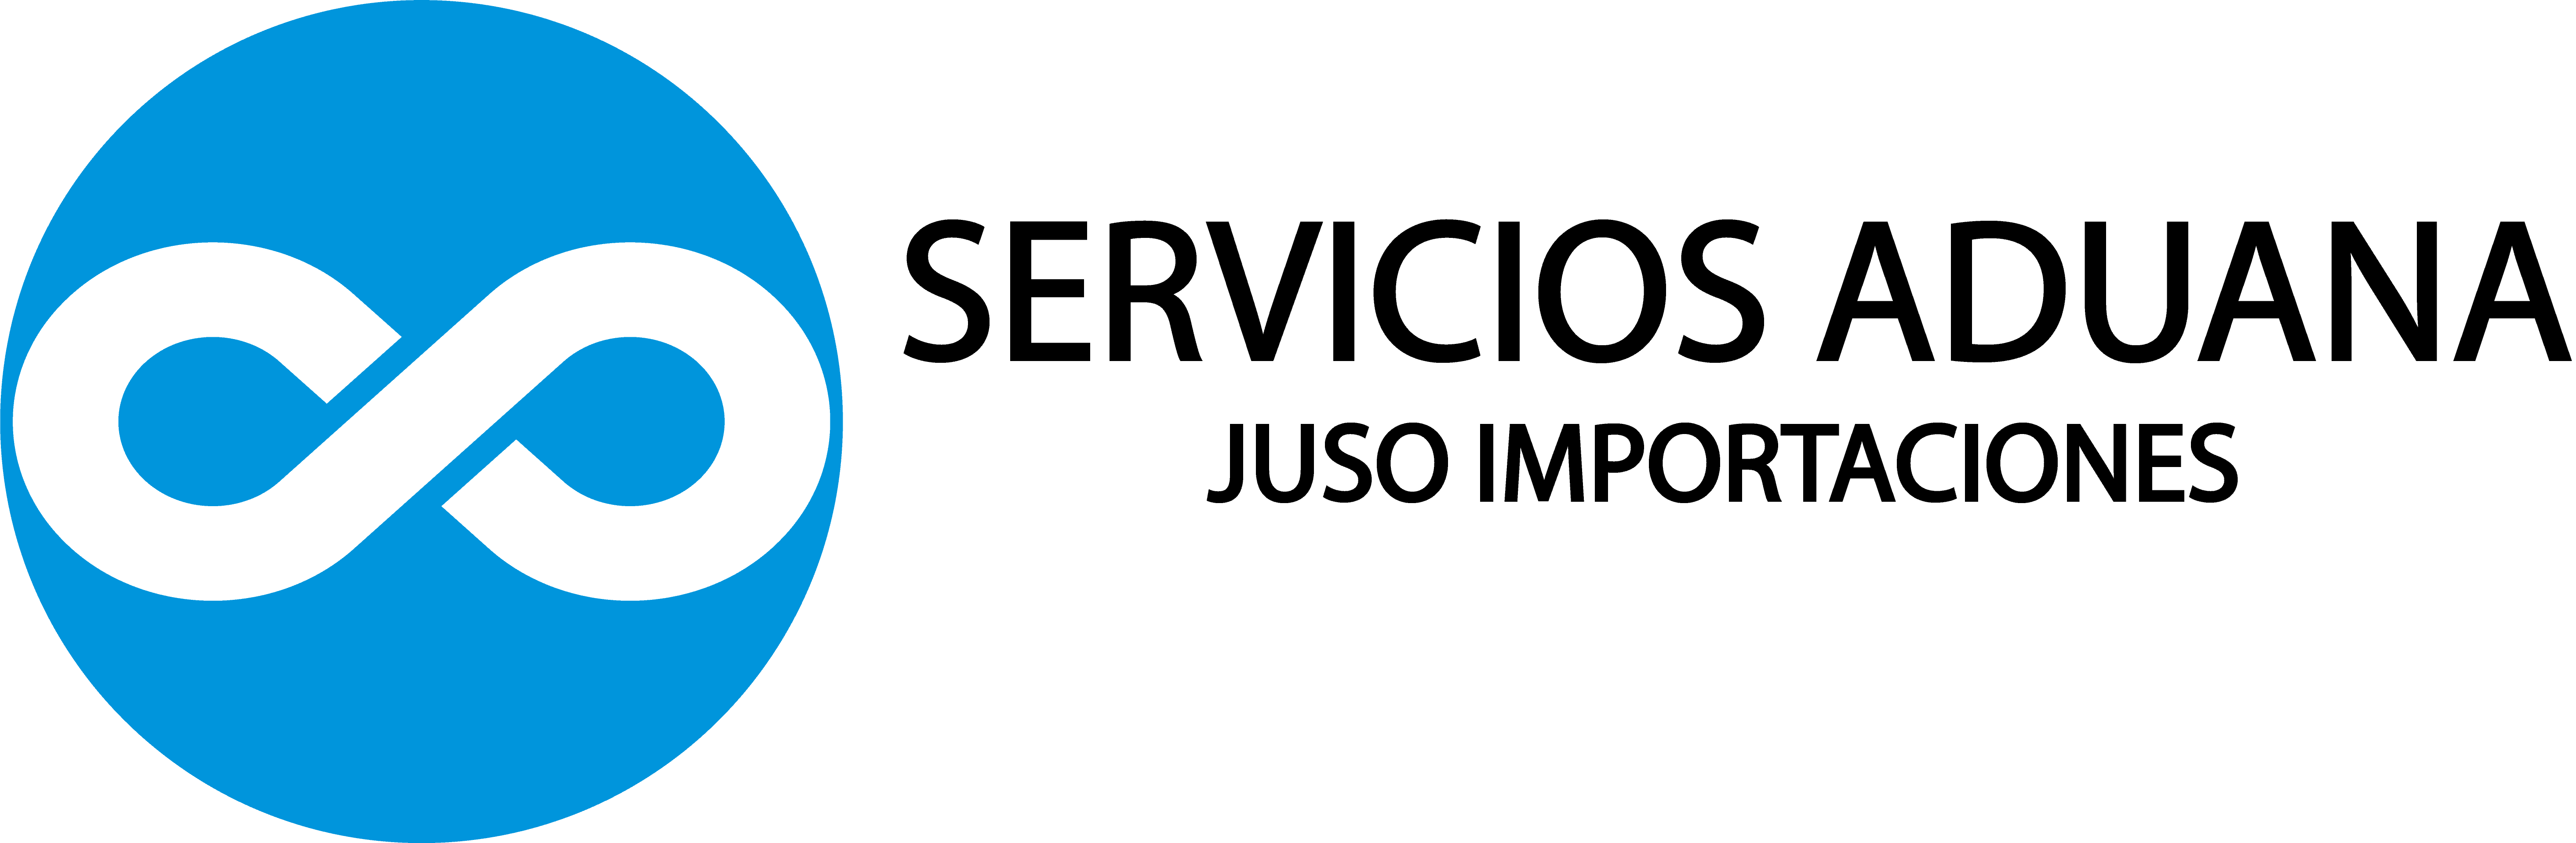 AGENCIA ADUANAL JUSO Logo